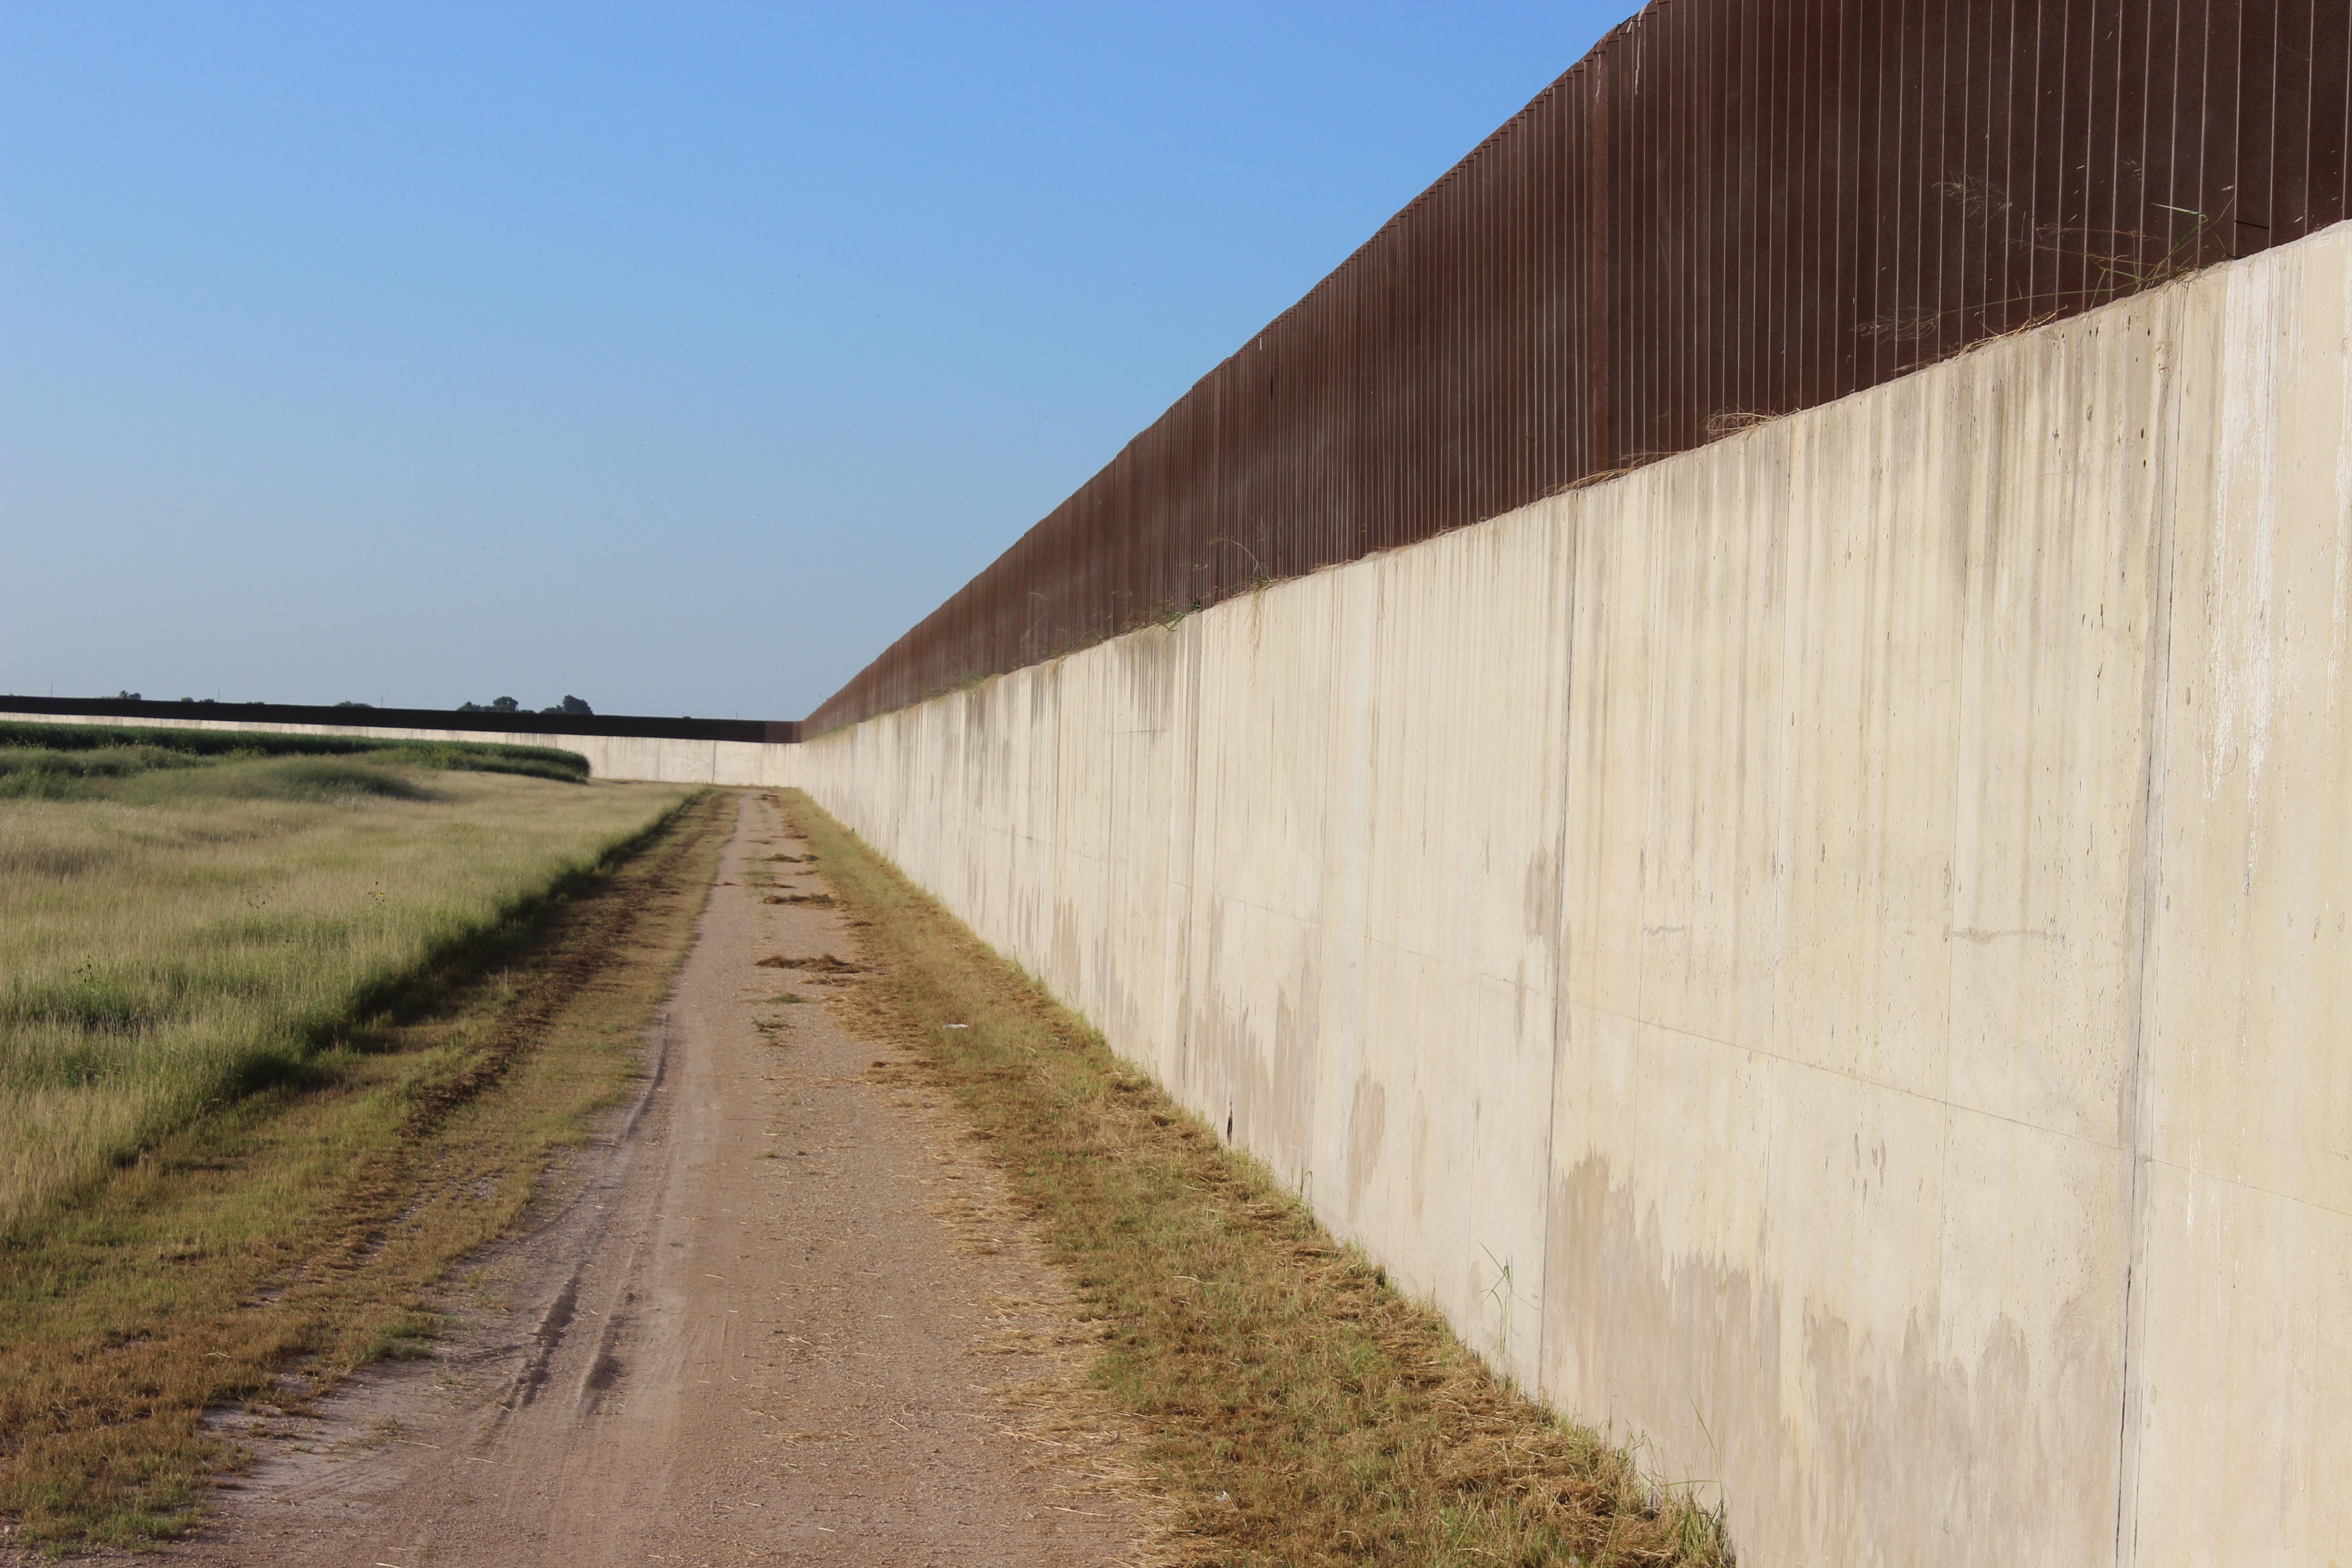 Border Wall Levee J III Concrete 956 969 1578